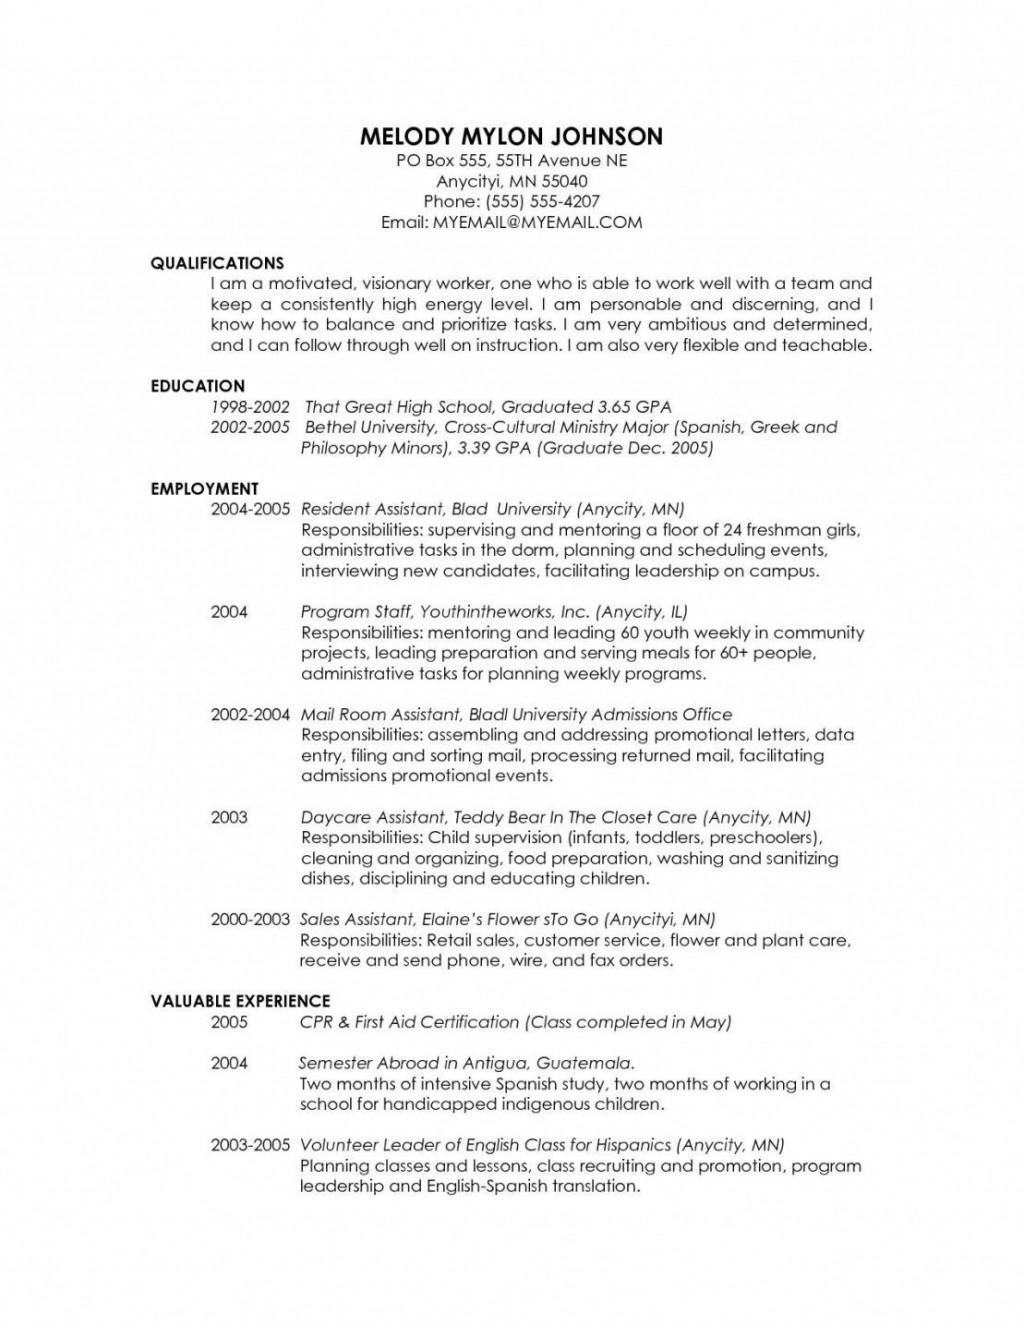 006 Excellent Grad School Resume Template Photo  Application Cv Graduate For AdmissionLarge